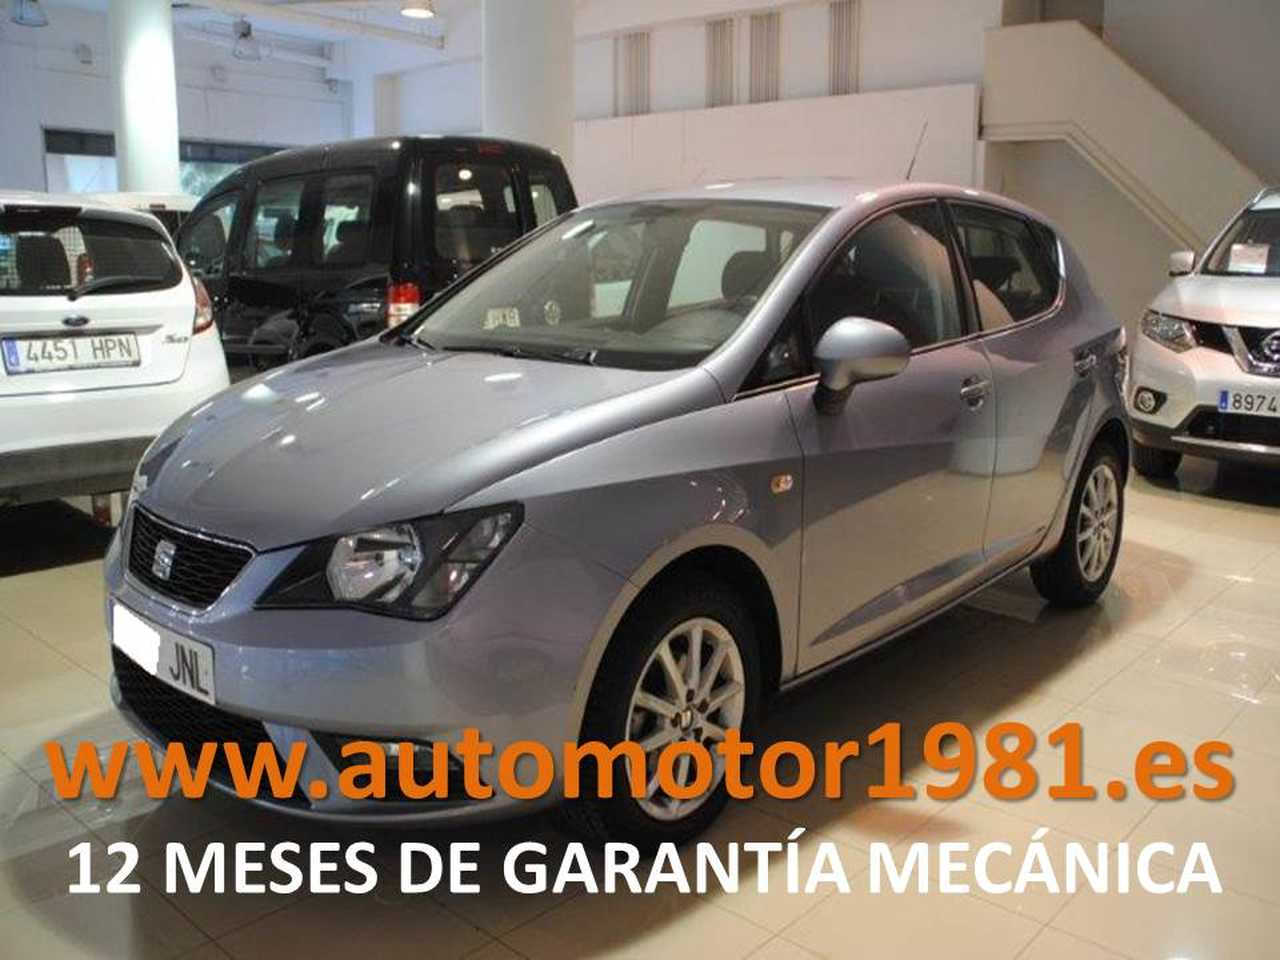 Seat Ibiza 1.4TDI CR S&S Style DSG - 12 MESES GARANTIA MECANICA  - Foto 1